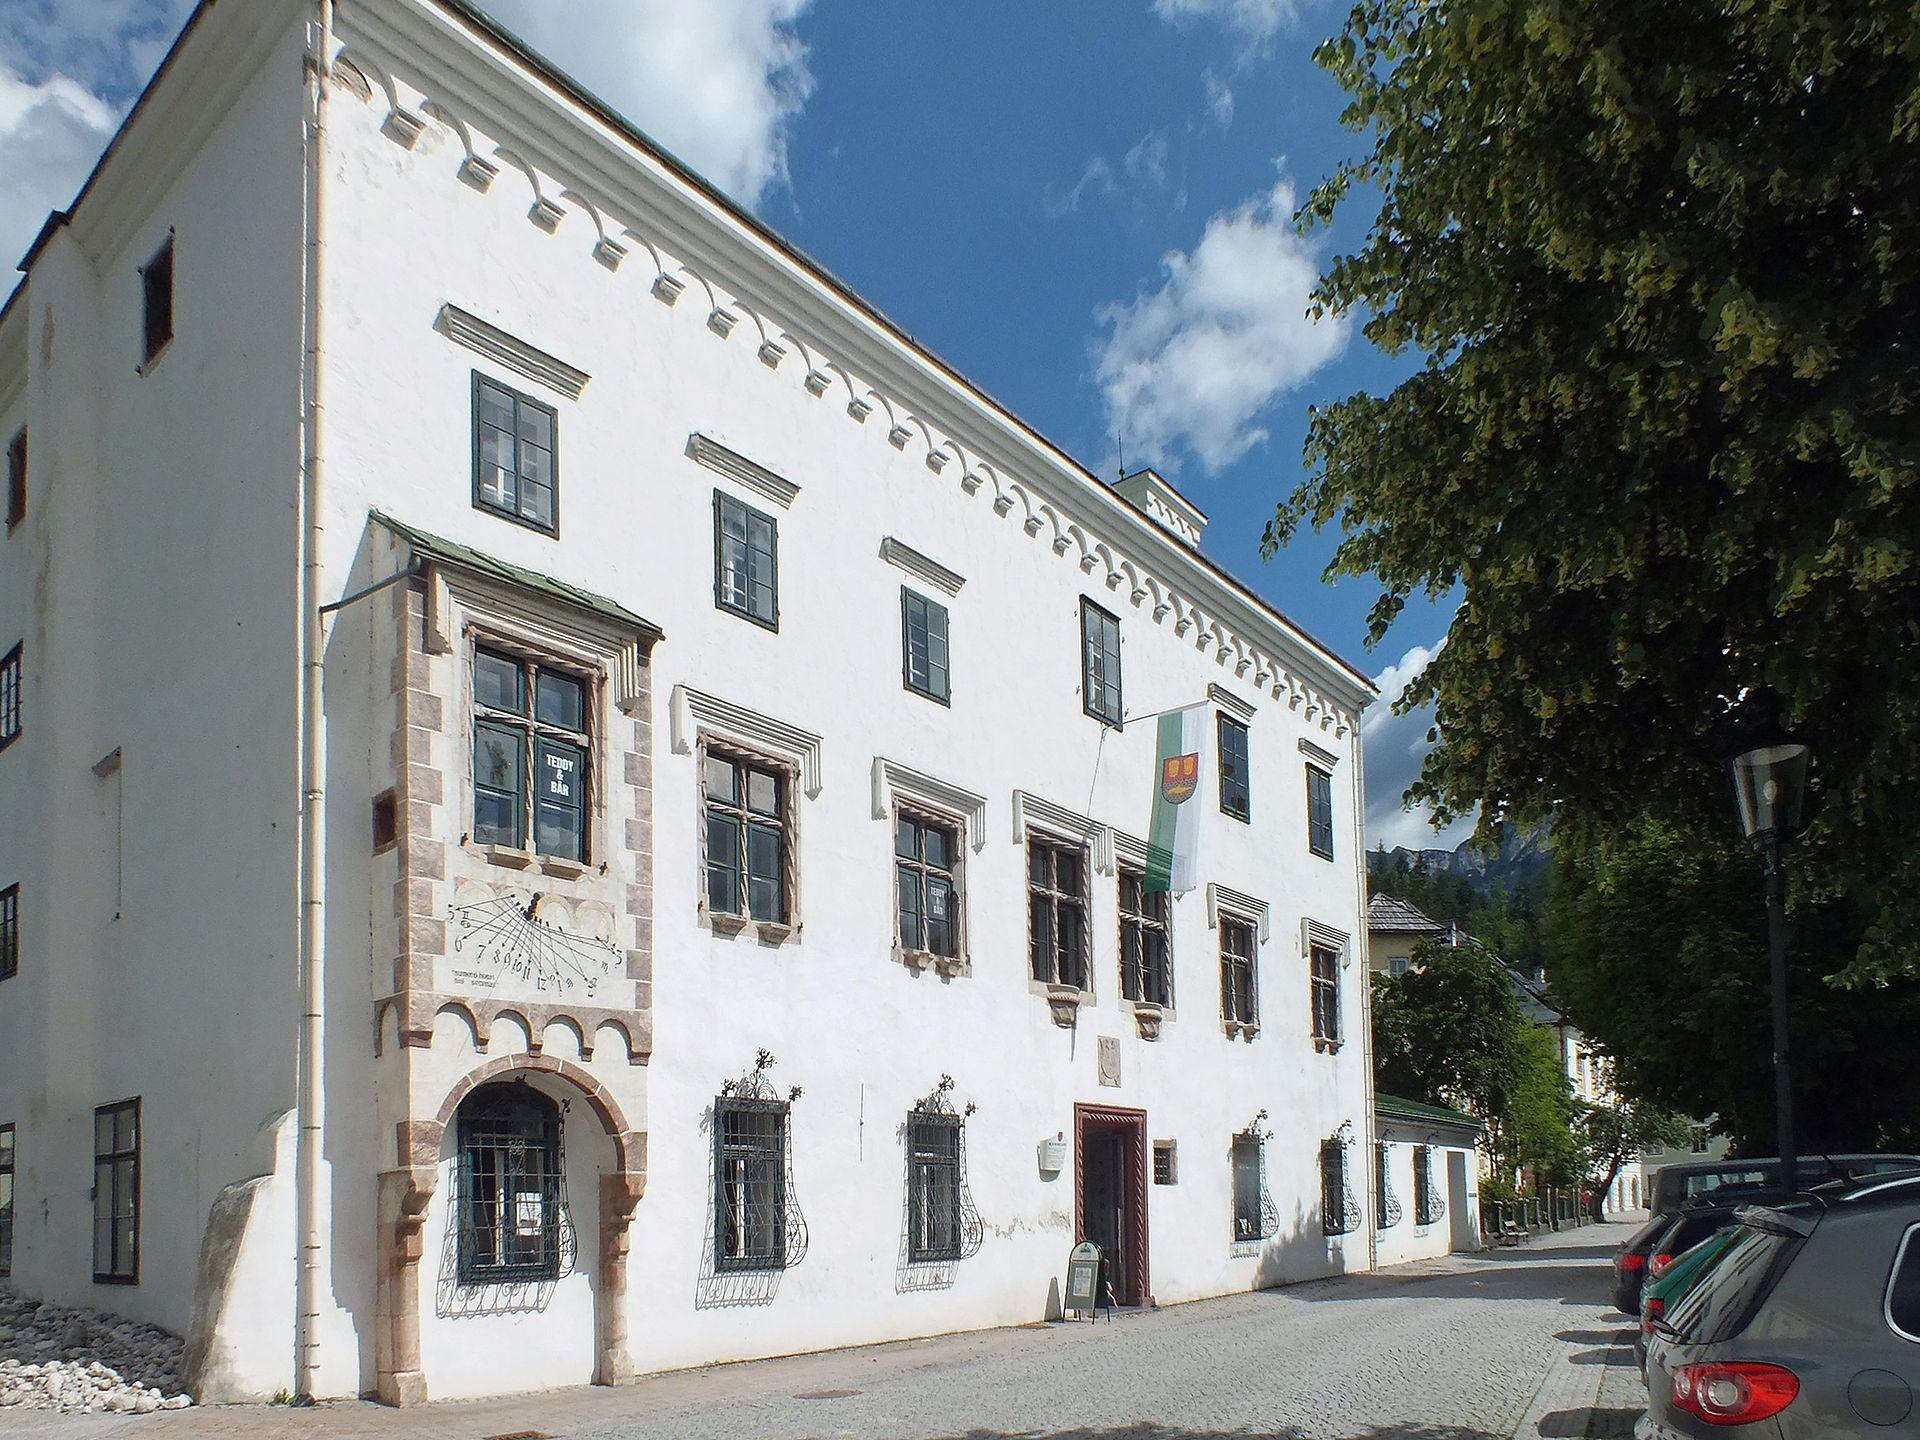 Ausseer kammerhofmuseum wikipedia for Haus bad aussee